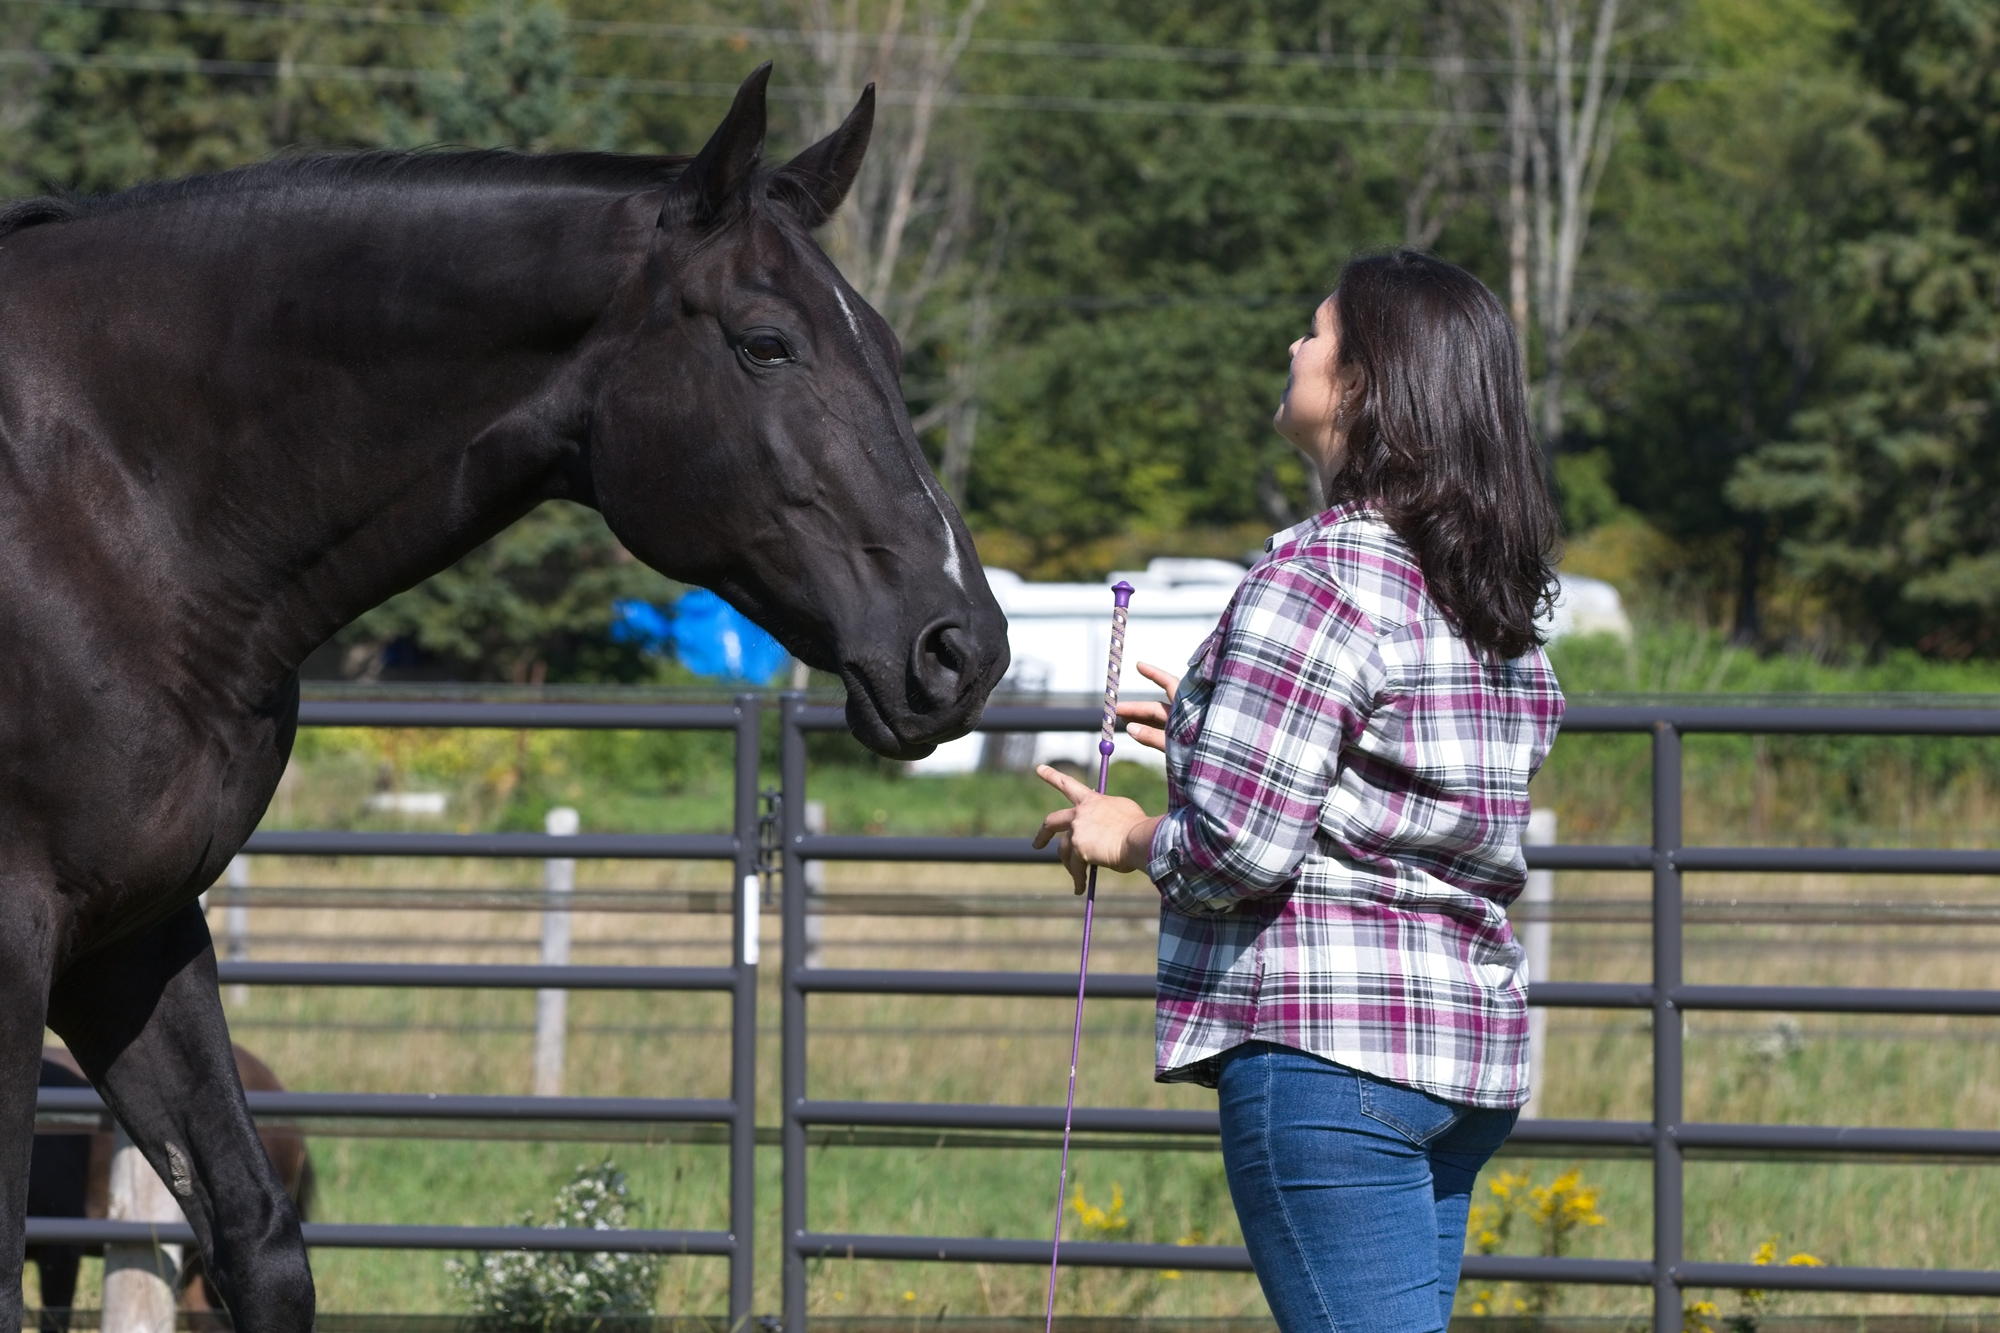 true-presence-horse-sense-carmen-theobald-grace-round-pen-equine-facilitated-learning-efl-eponaquest-instructor-coach.jpg